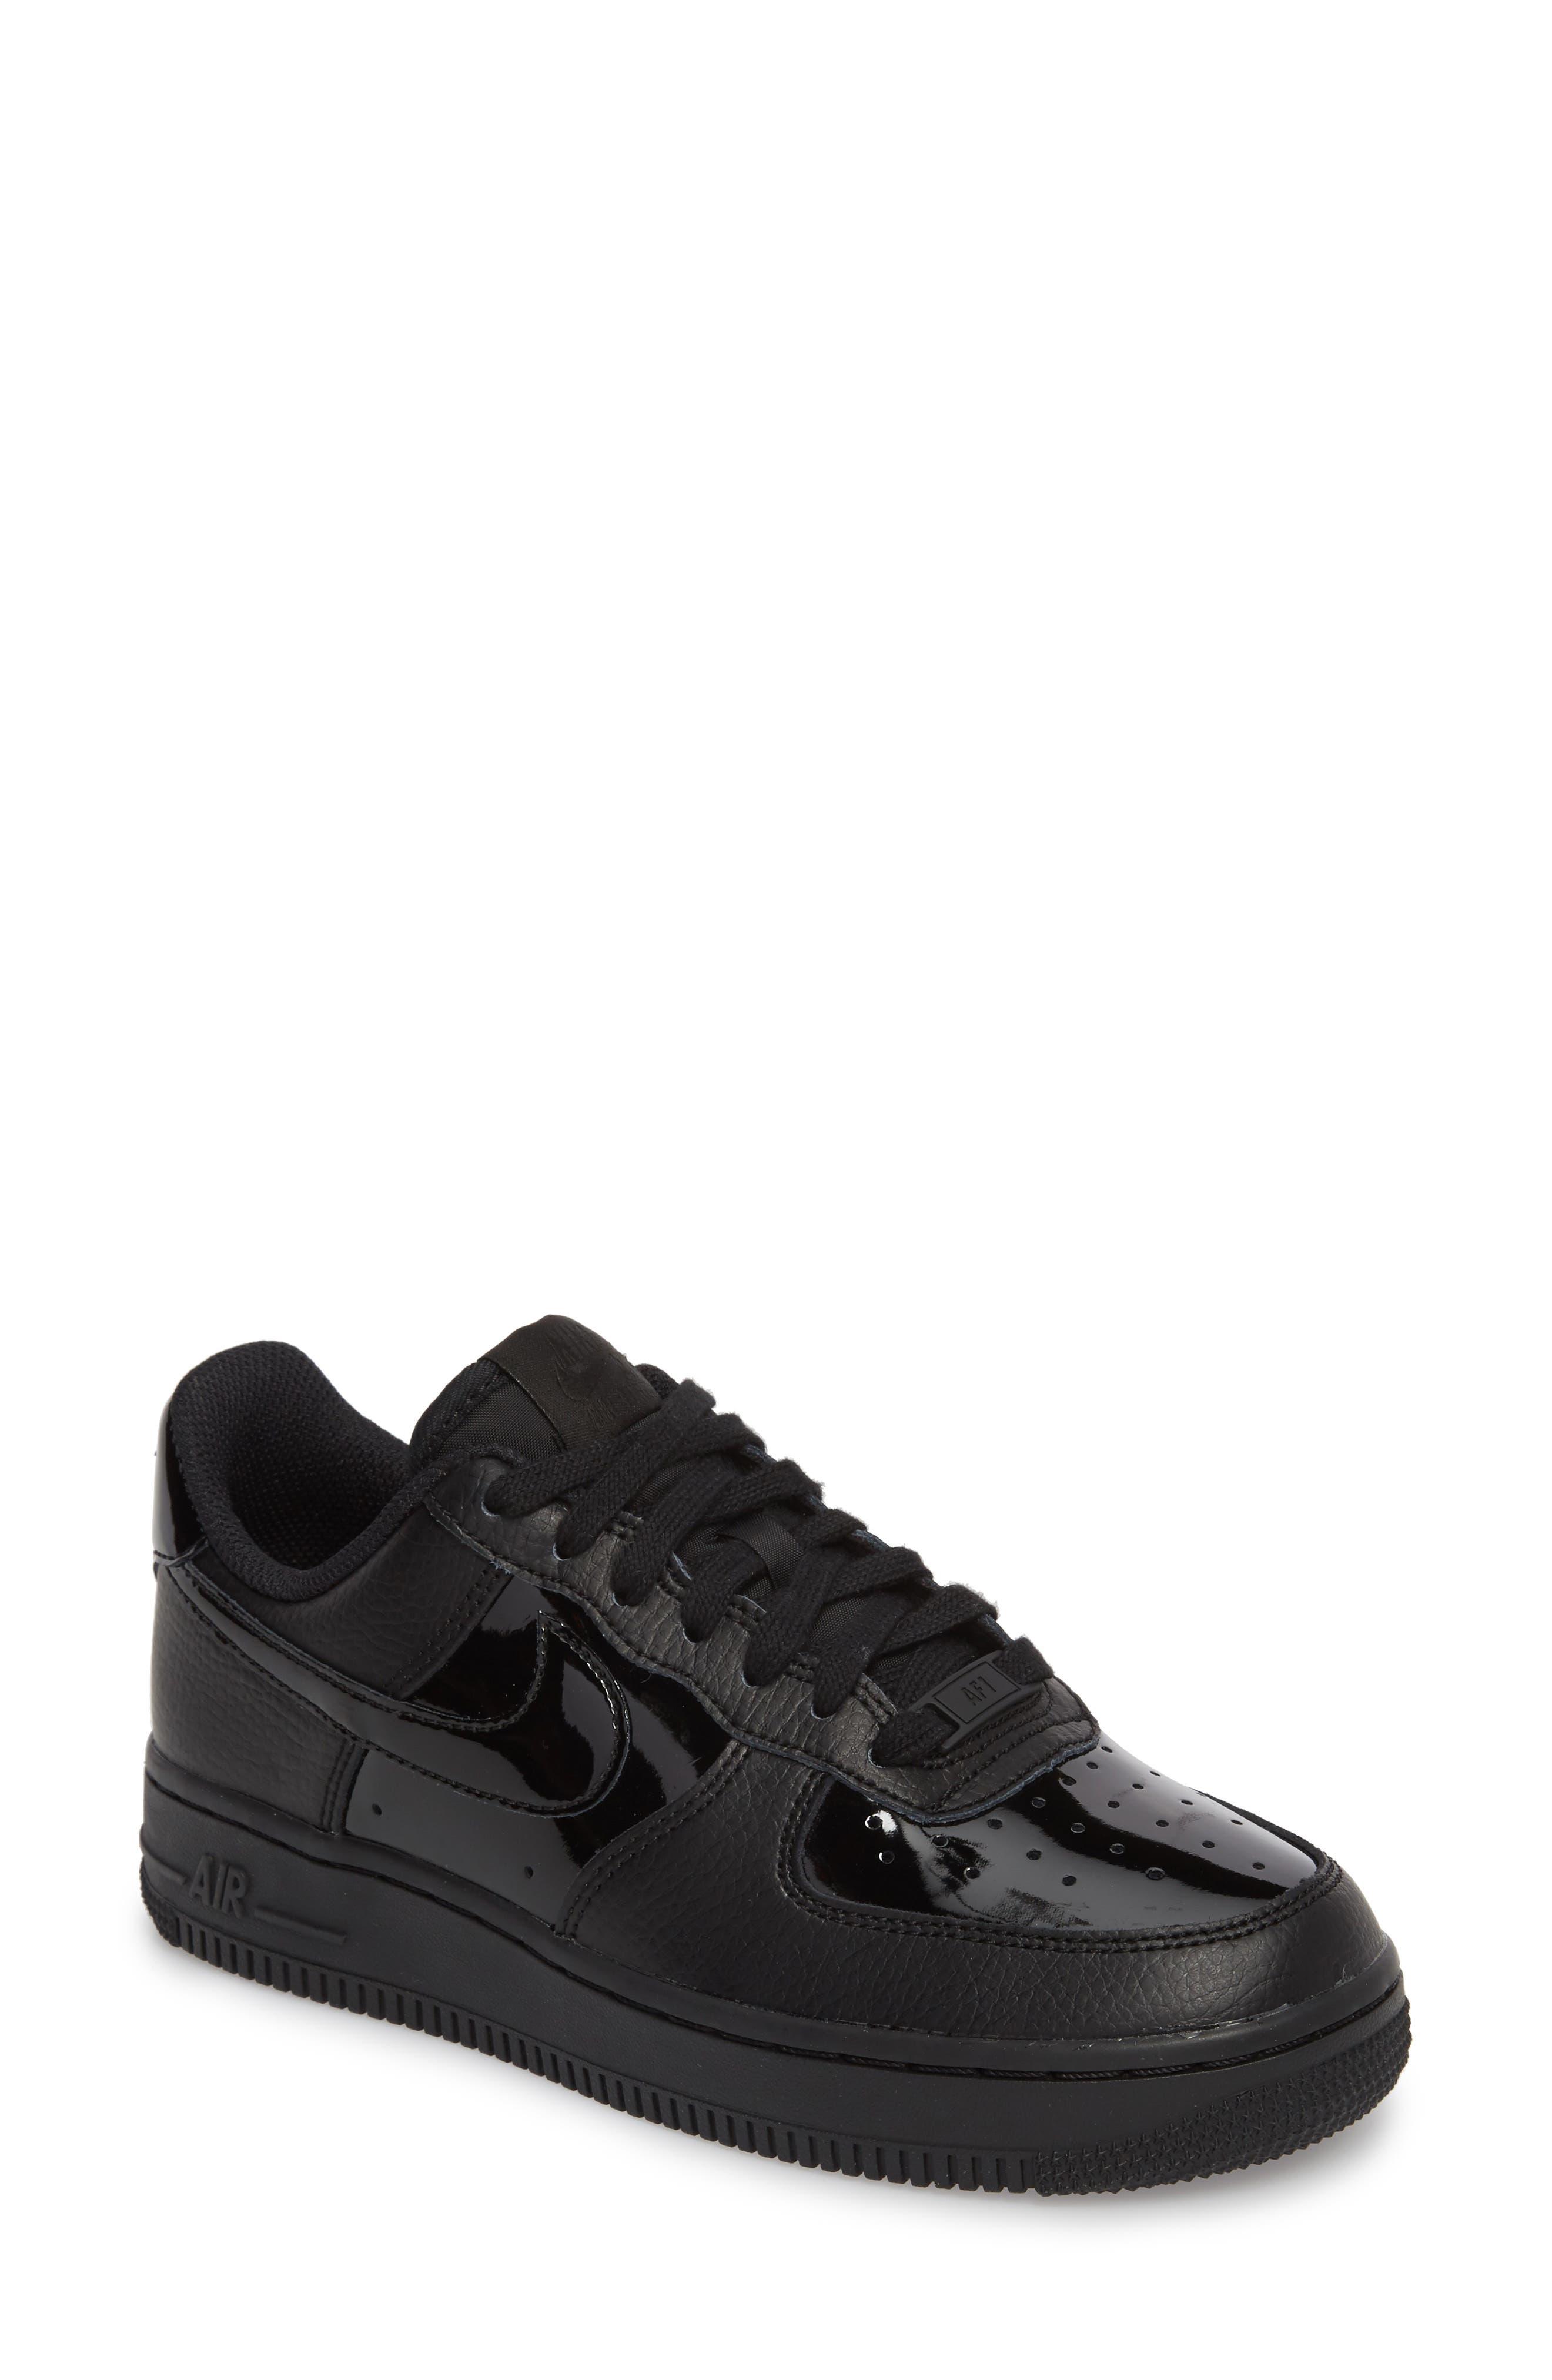 Air Force 1 '07 Sneaker,                             Main thumbnail 1, color,                             001